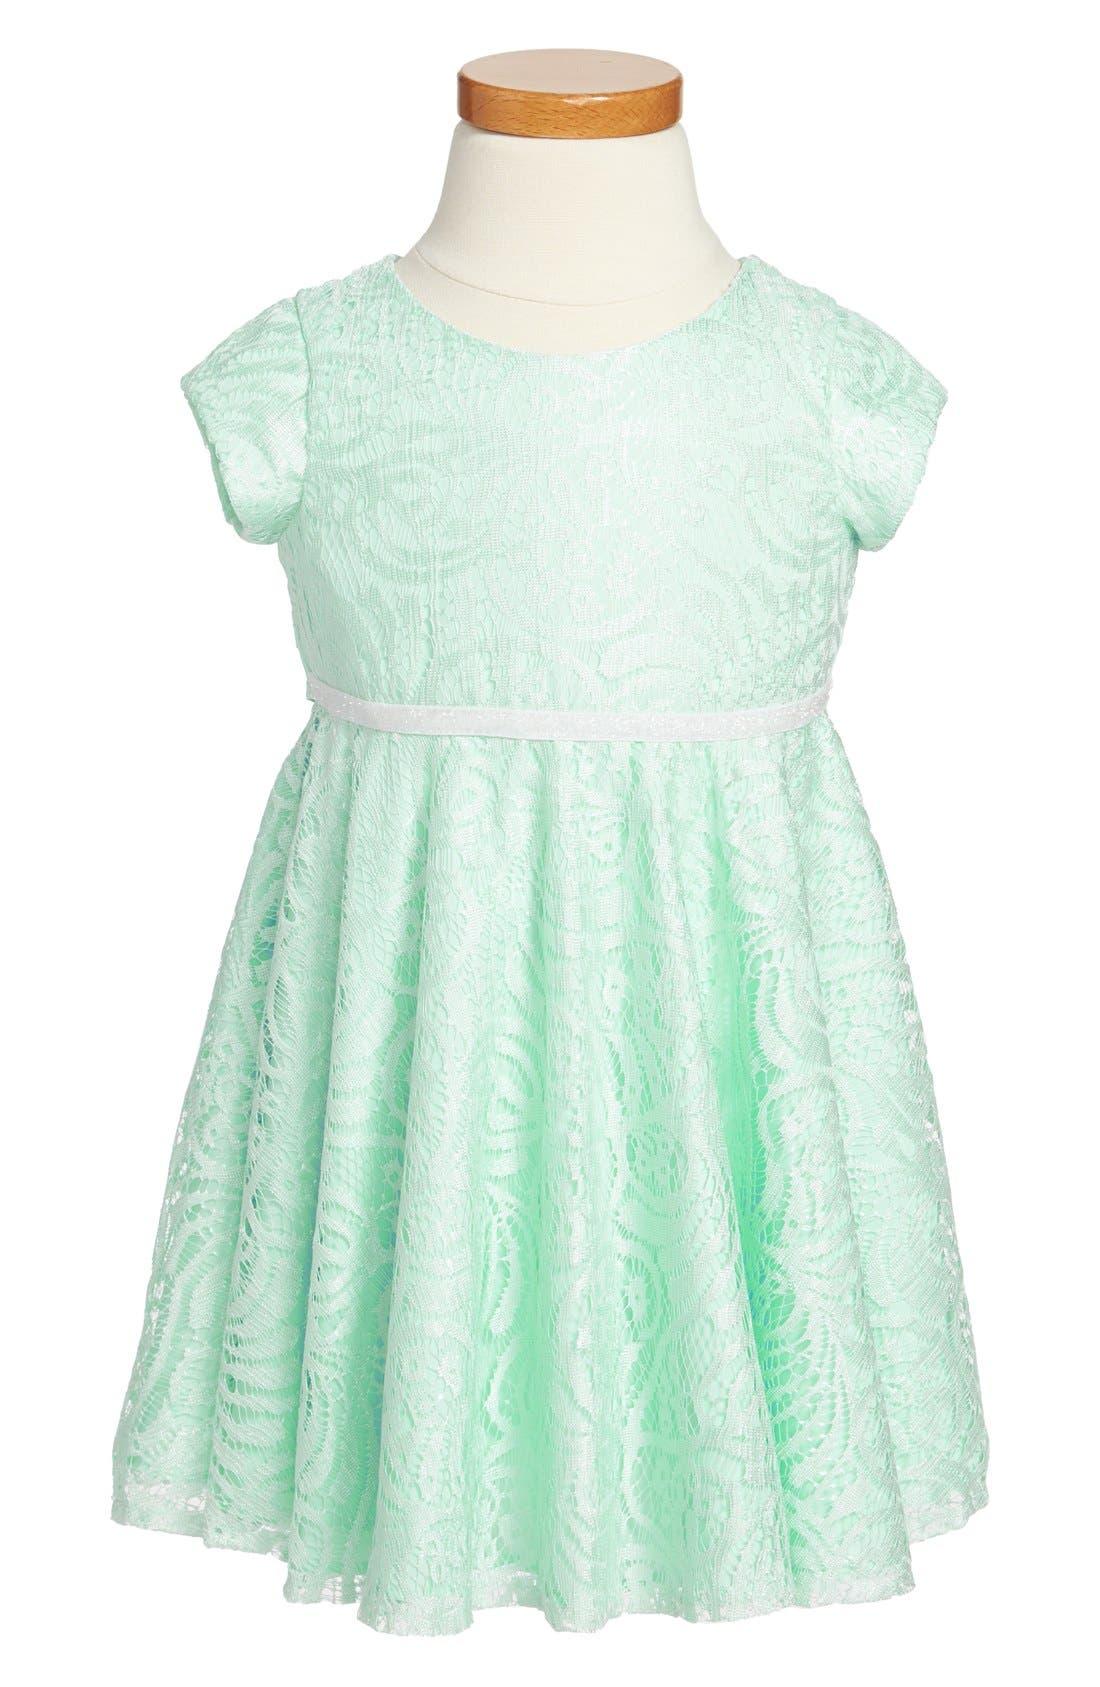 Main Image - Pippa & Julie Lace Skater Dress (Toddler Girls)